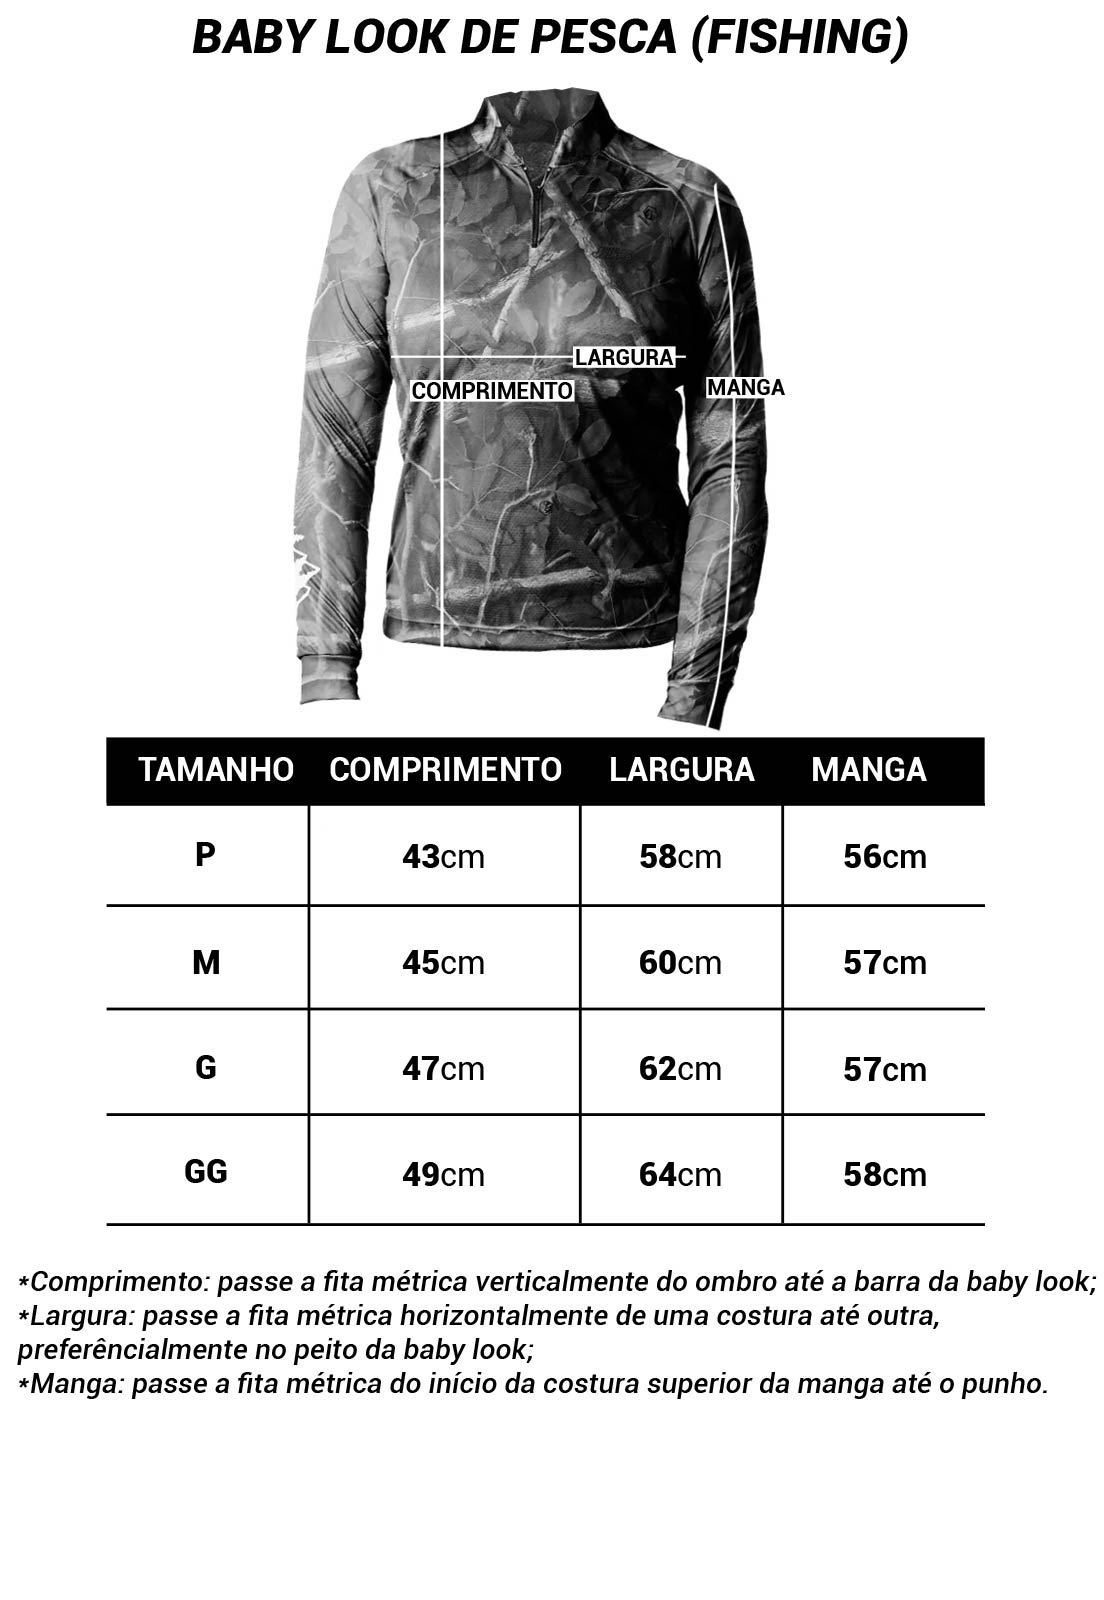 CAMISA DE PESCA FISH TUCUNARÉ 06 FEMININA + BANDANA GRÁTIS  - REAL HUNTER OUTDOORS